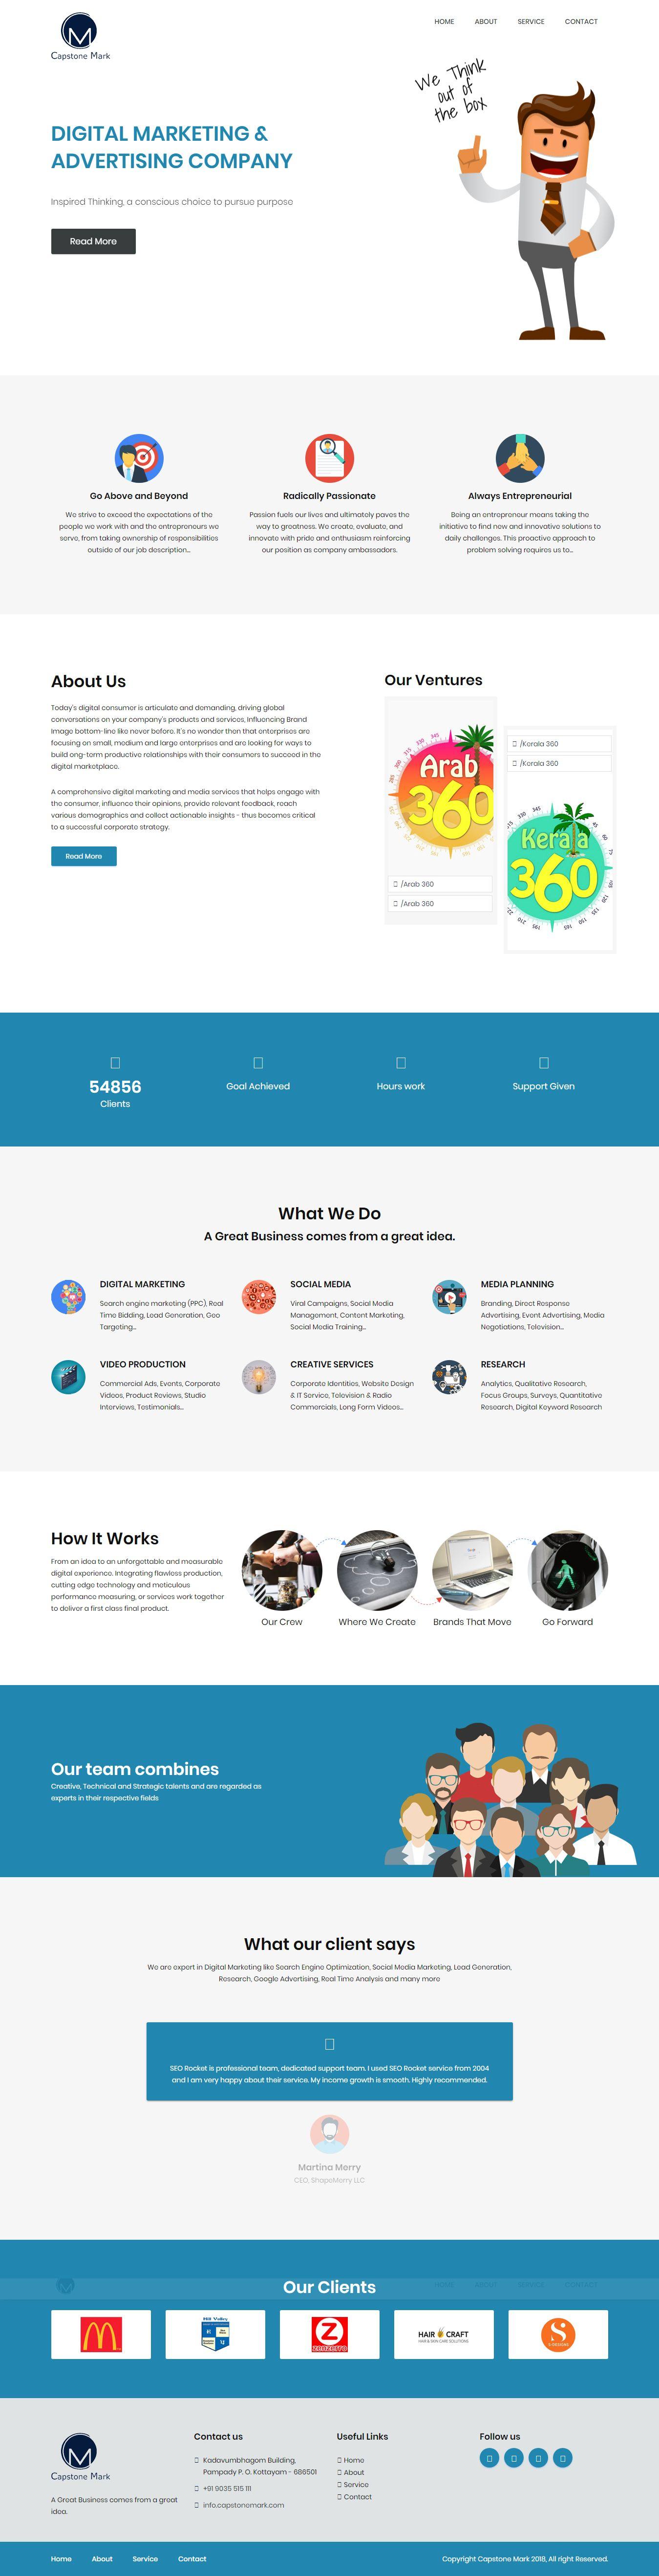 Capstone Mark - Static Website created by www riolabz com